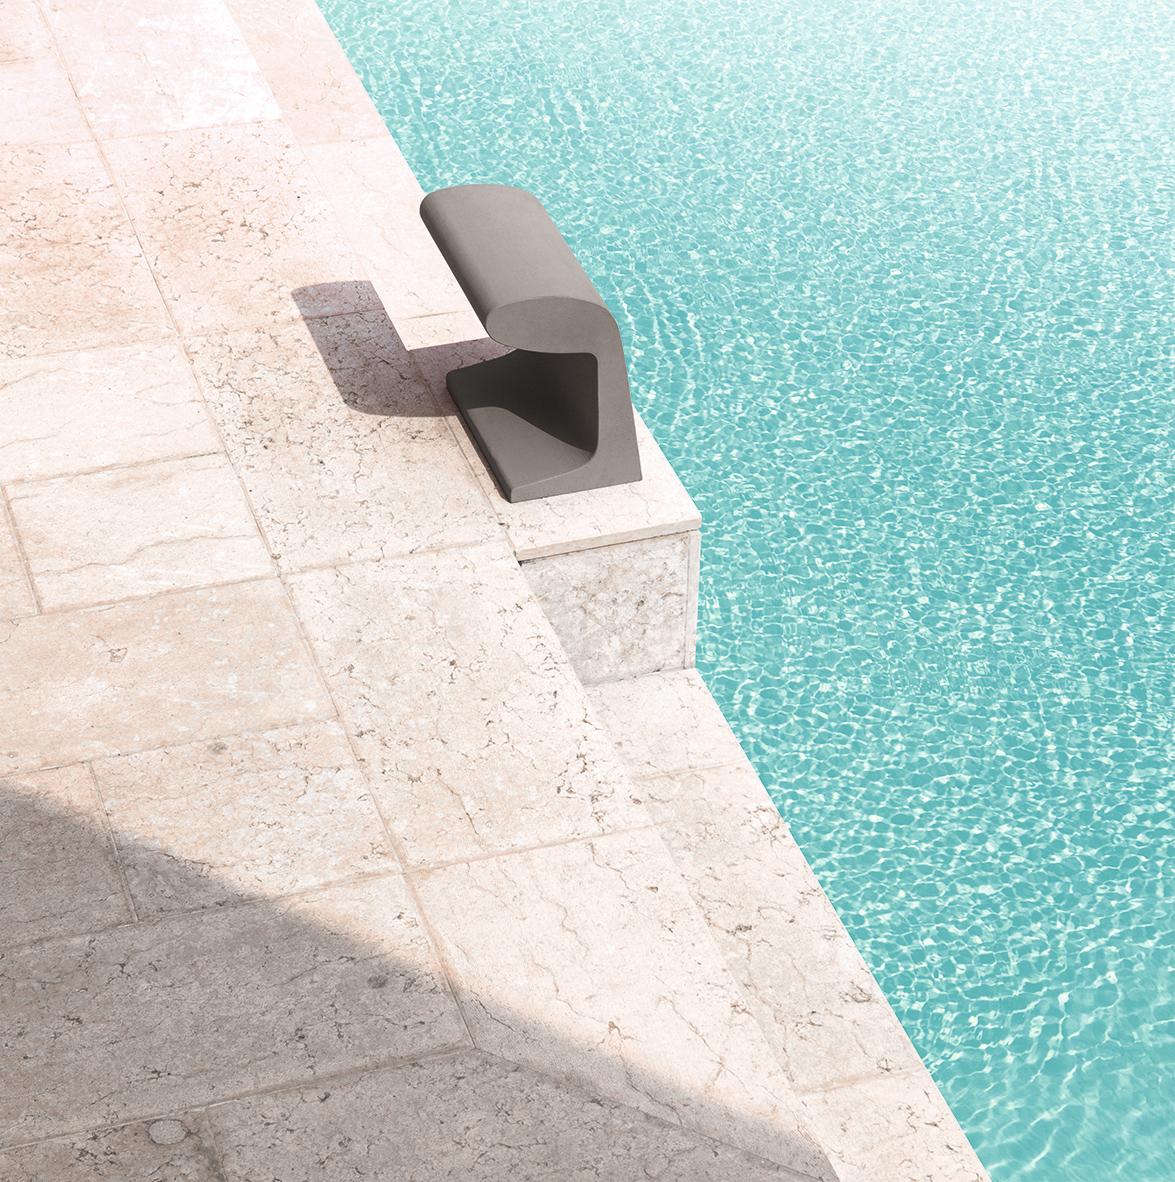 borne-beton-grand_02